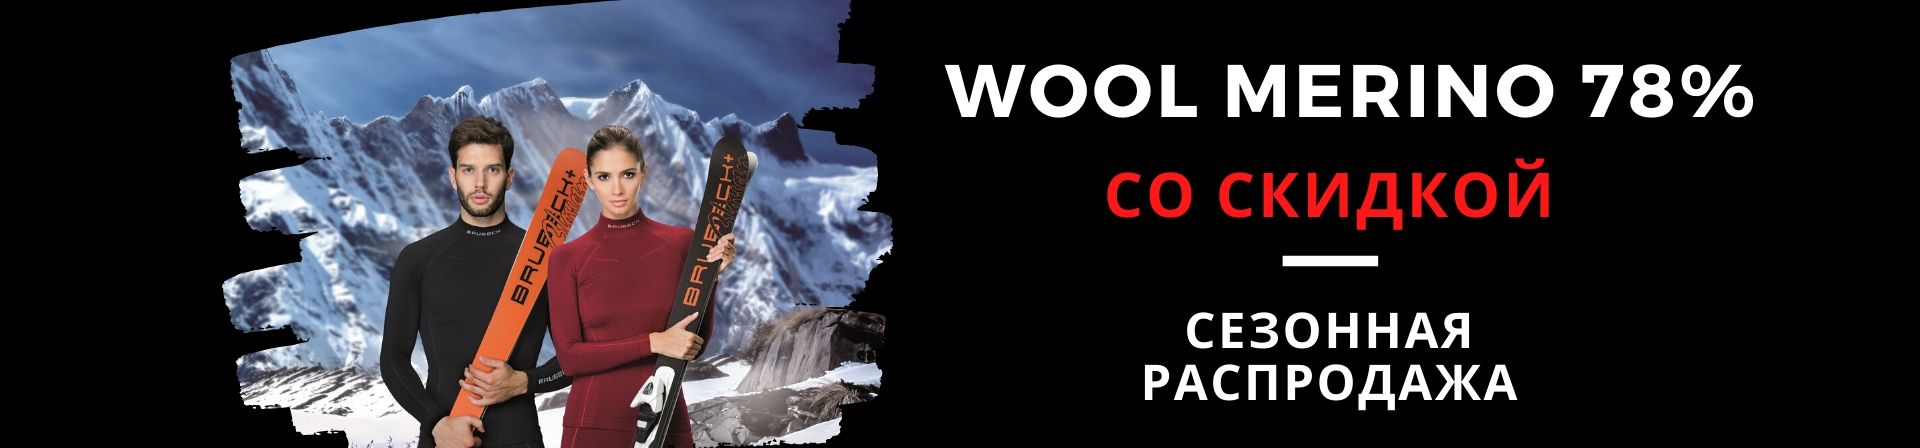 Сезонная распродажа Wool Merino 78%